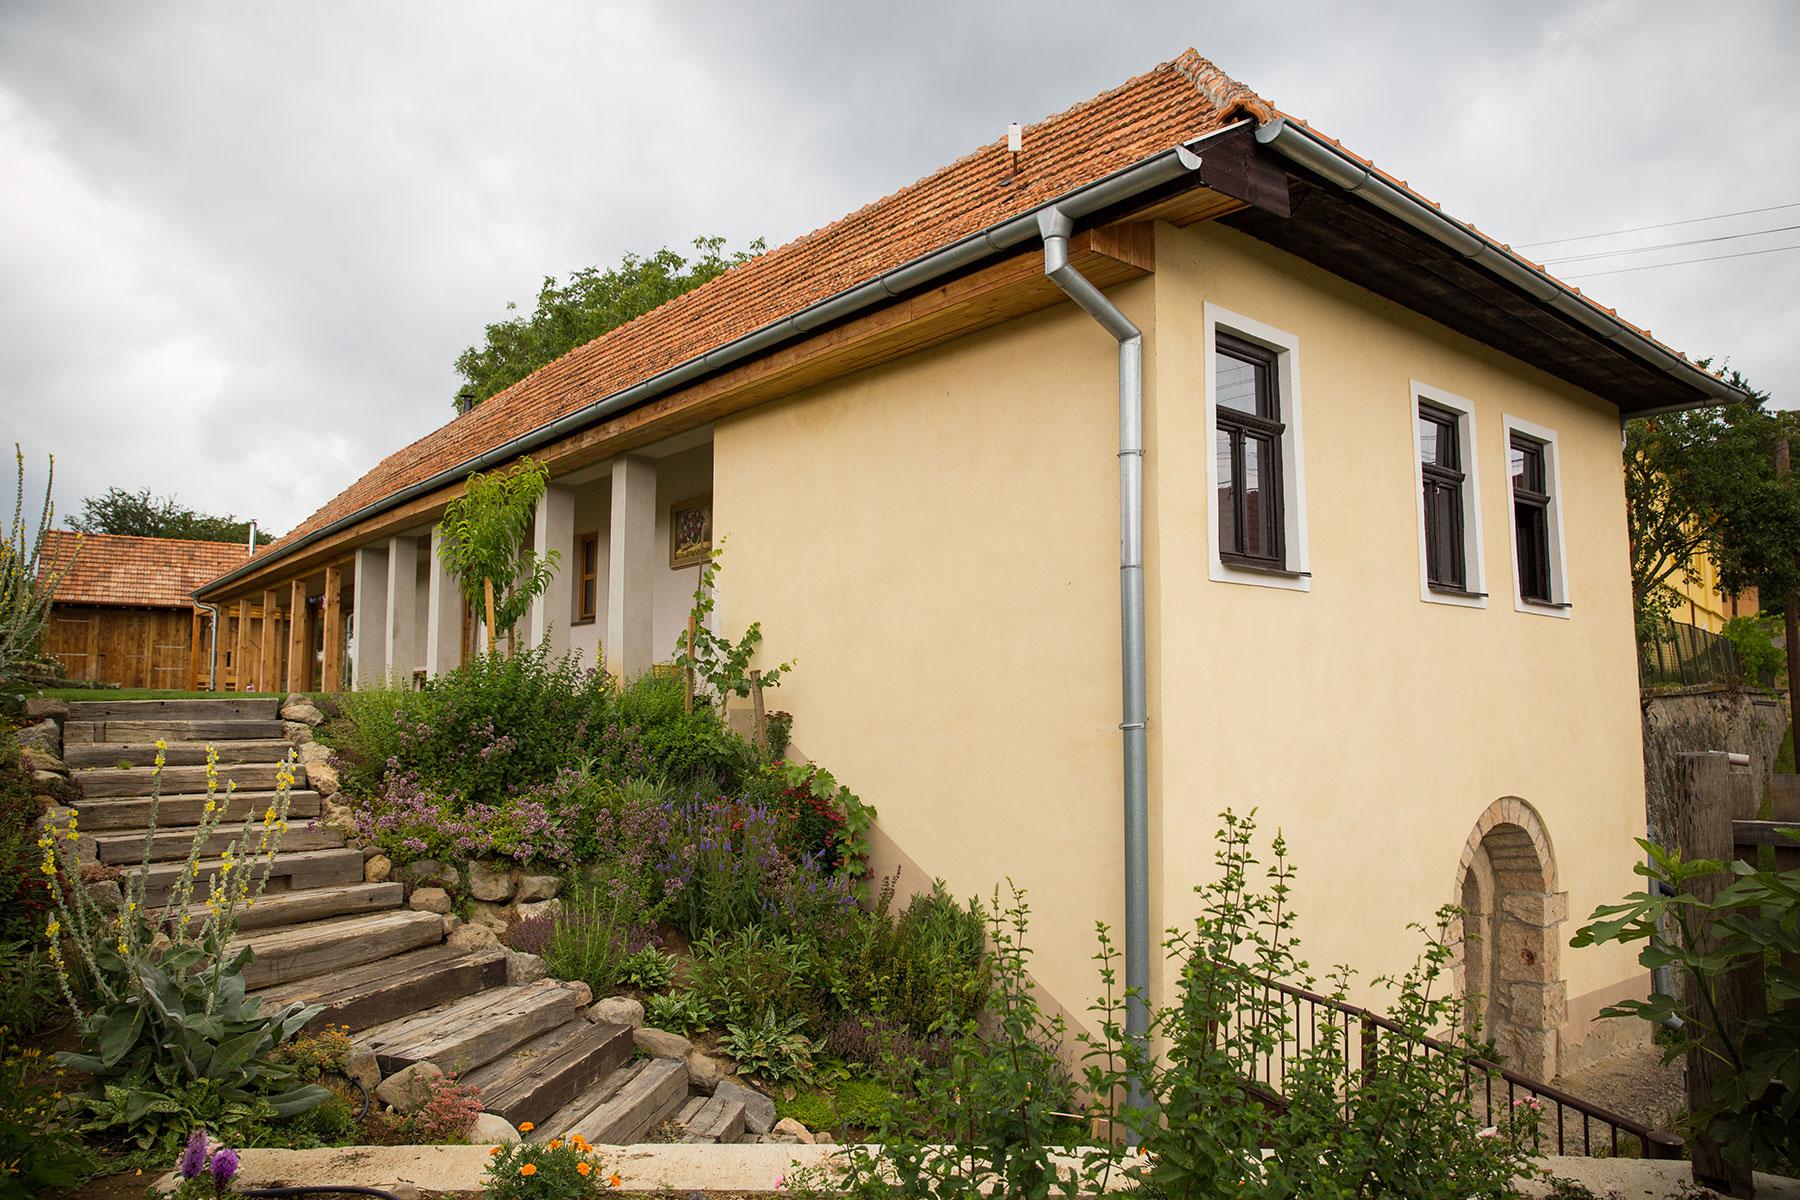 Povodny dom s pristavbou autor Lubos Dobias